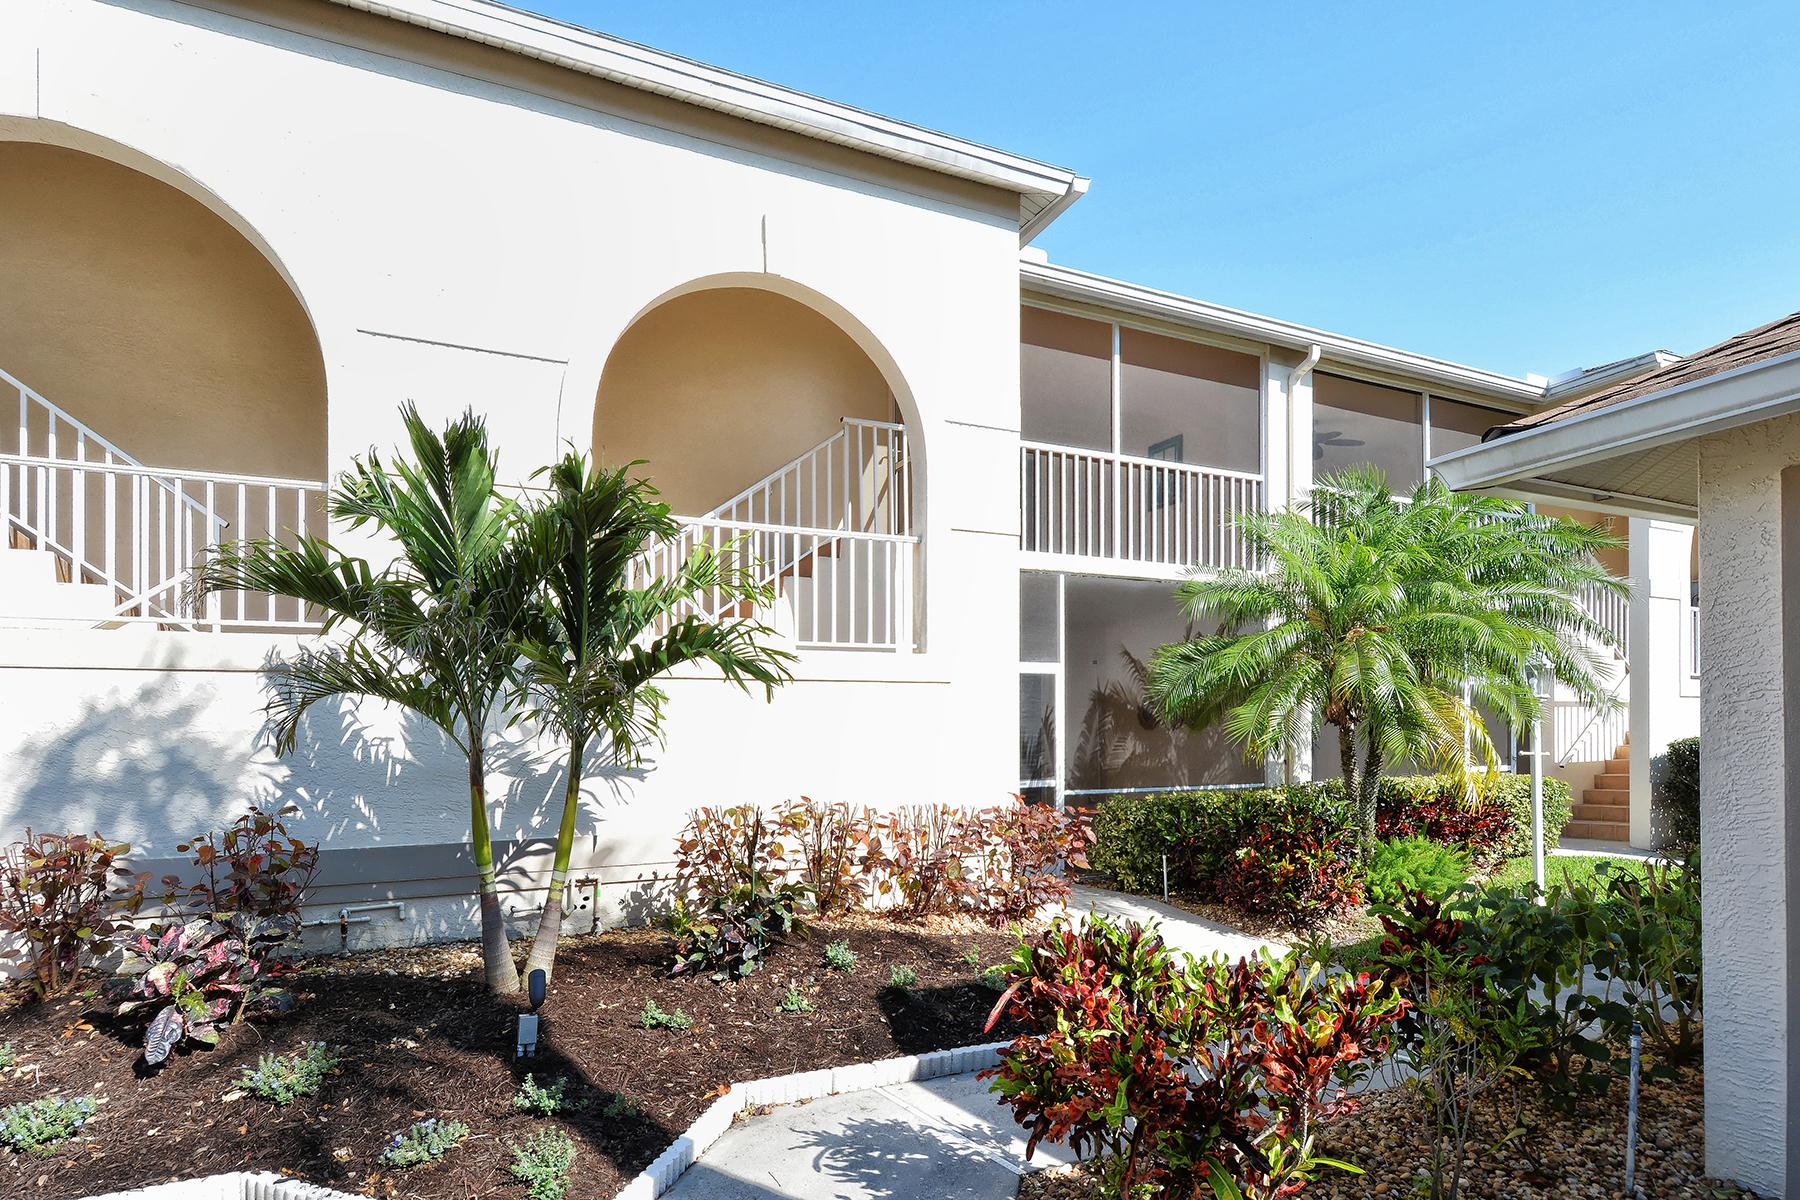 condominiums for Sale at SARASOTA 9470 High Gate Dr , 2225 Sarasota, Florida 34238 United States